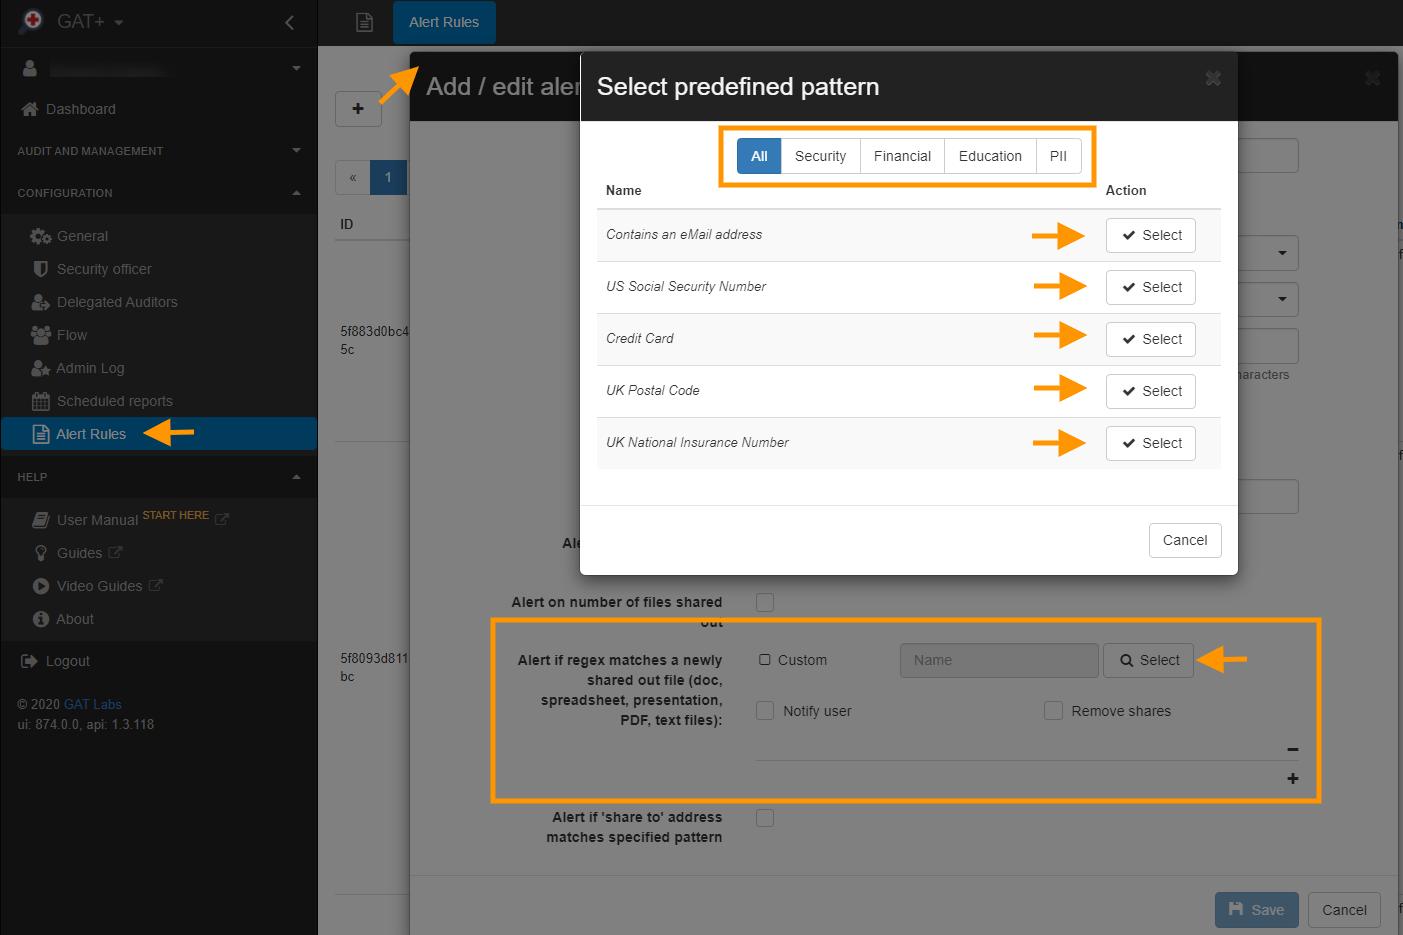 GAT+ | One Click Drive DLP Regex Alert Rules Templates 1